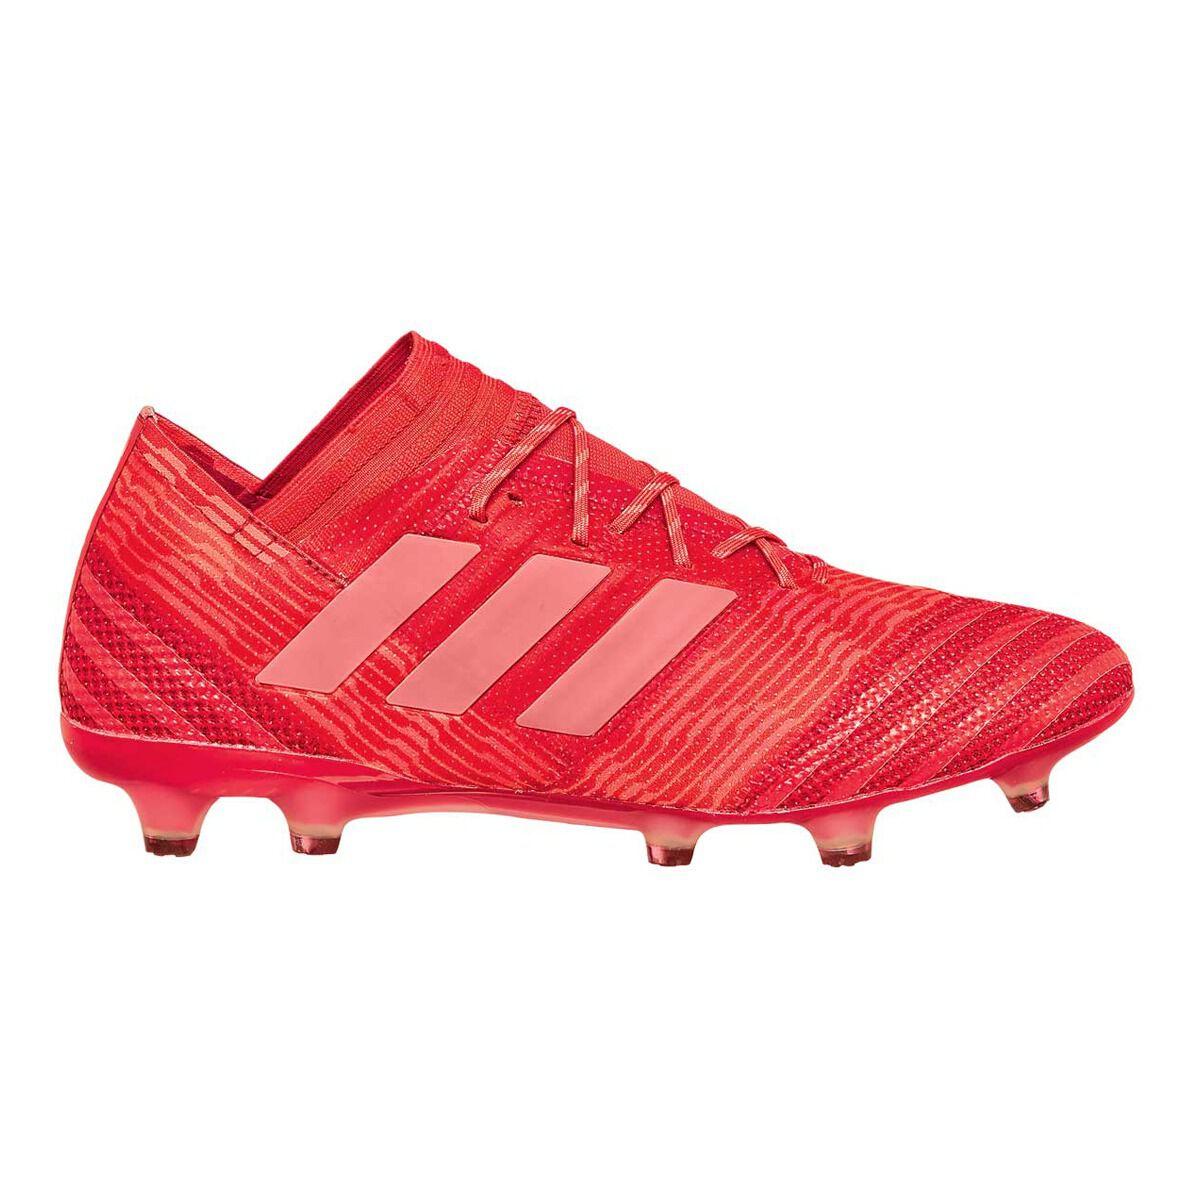 Adidas nemeziz FG hombre botas de fútbol naranja / rojo nosotros 8 adultos